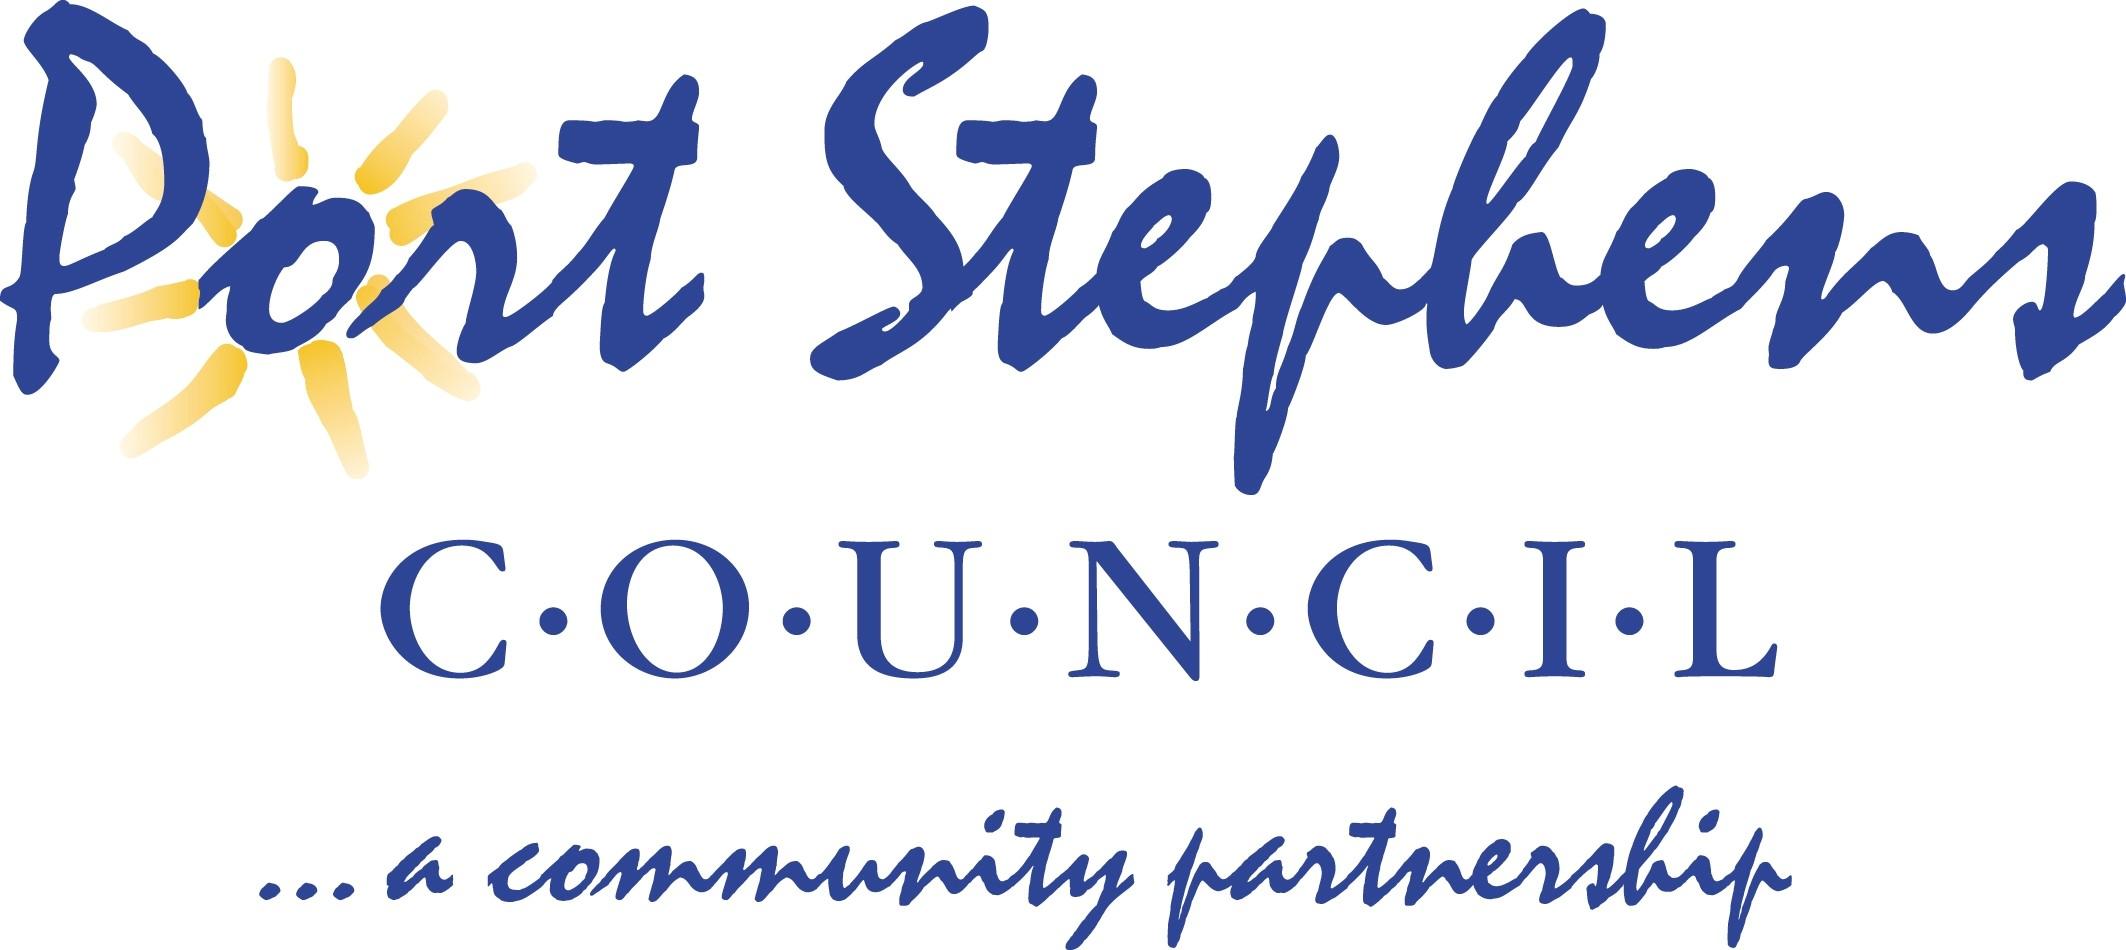 port stephens council.jpg